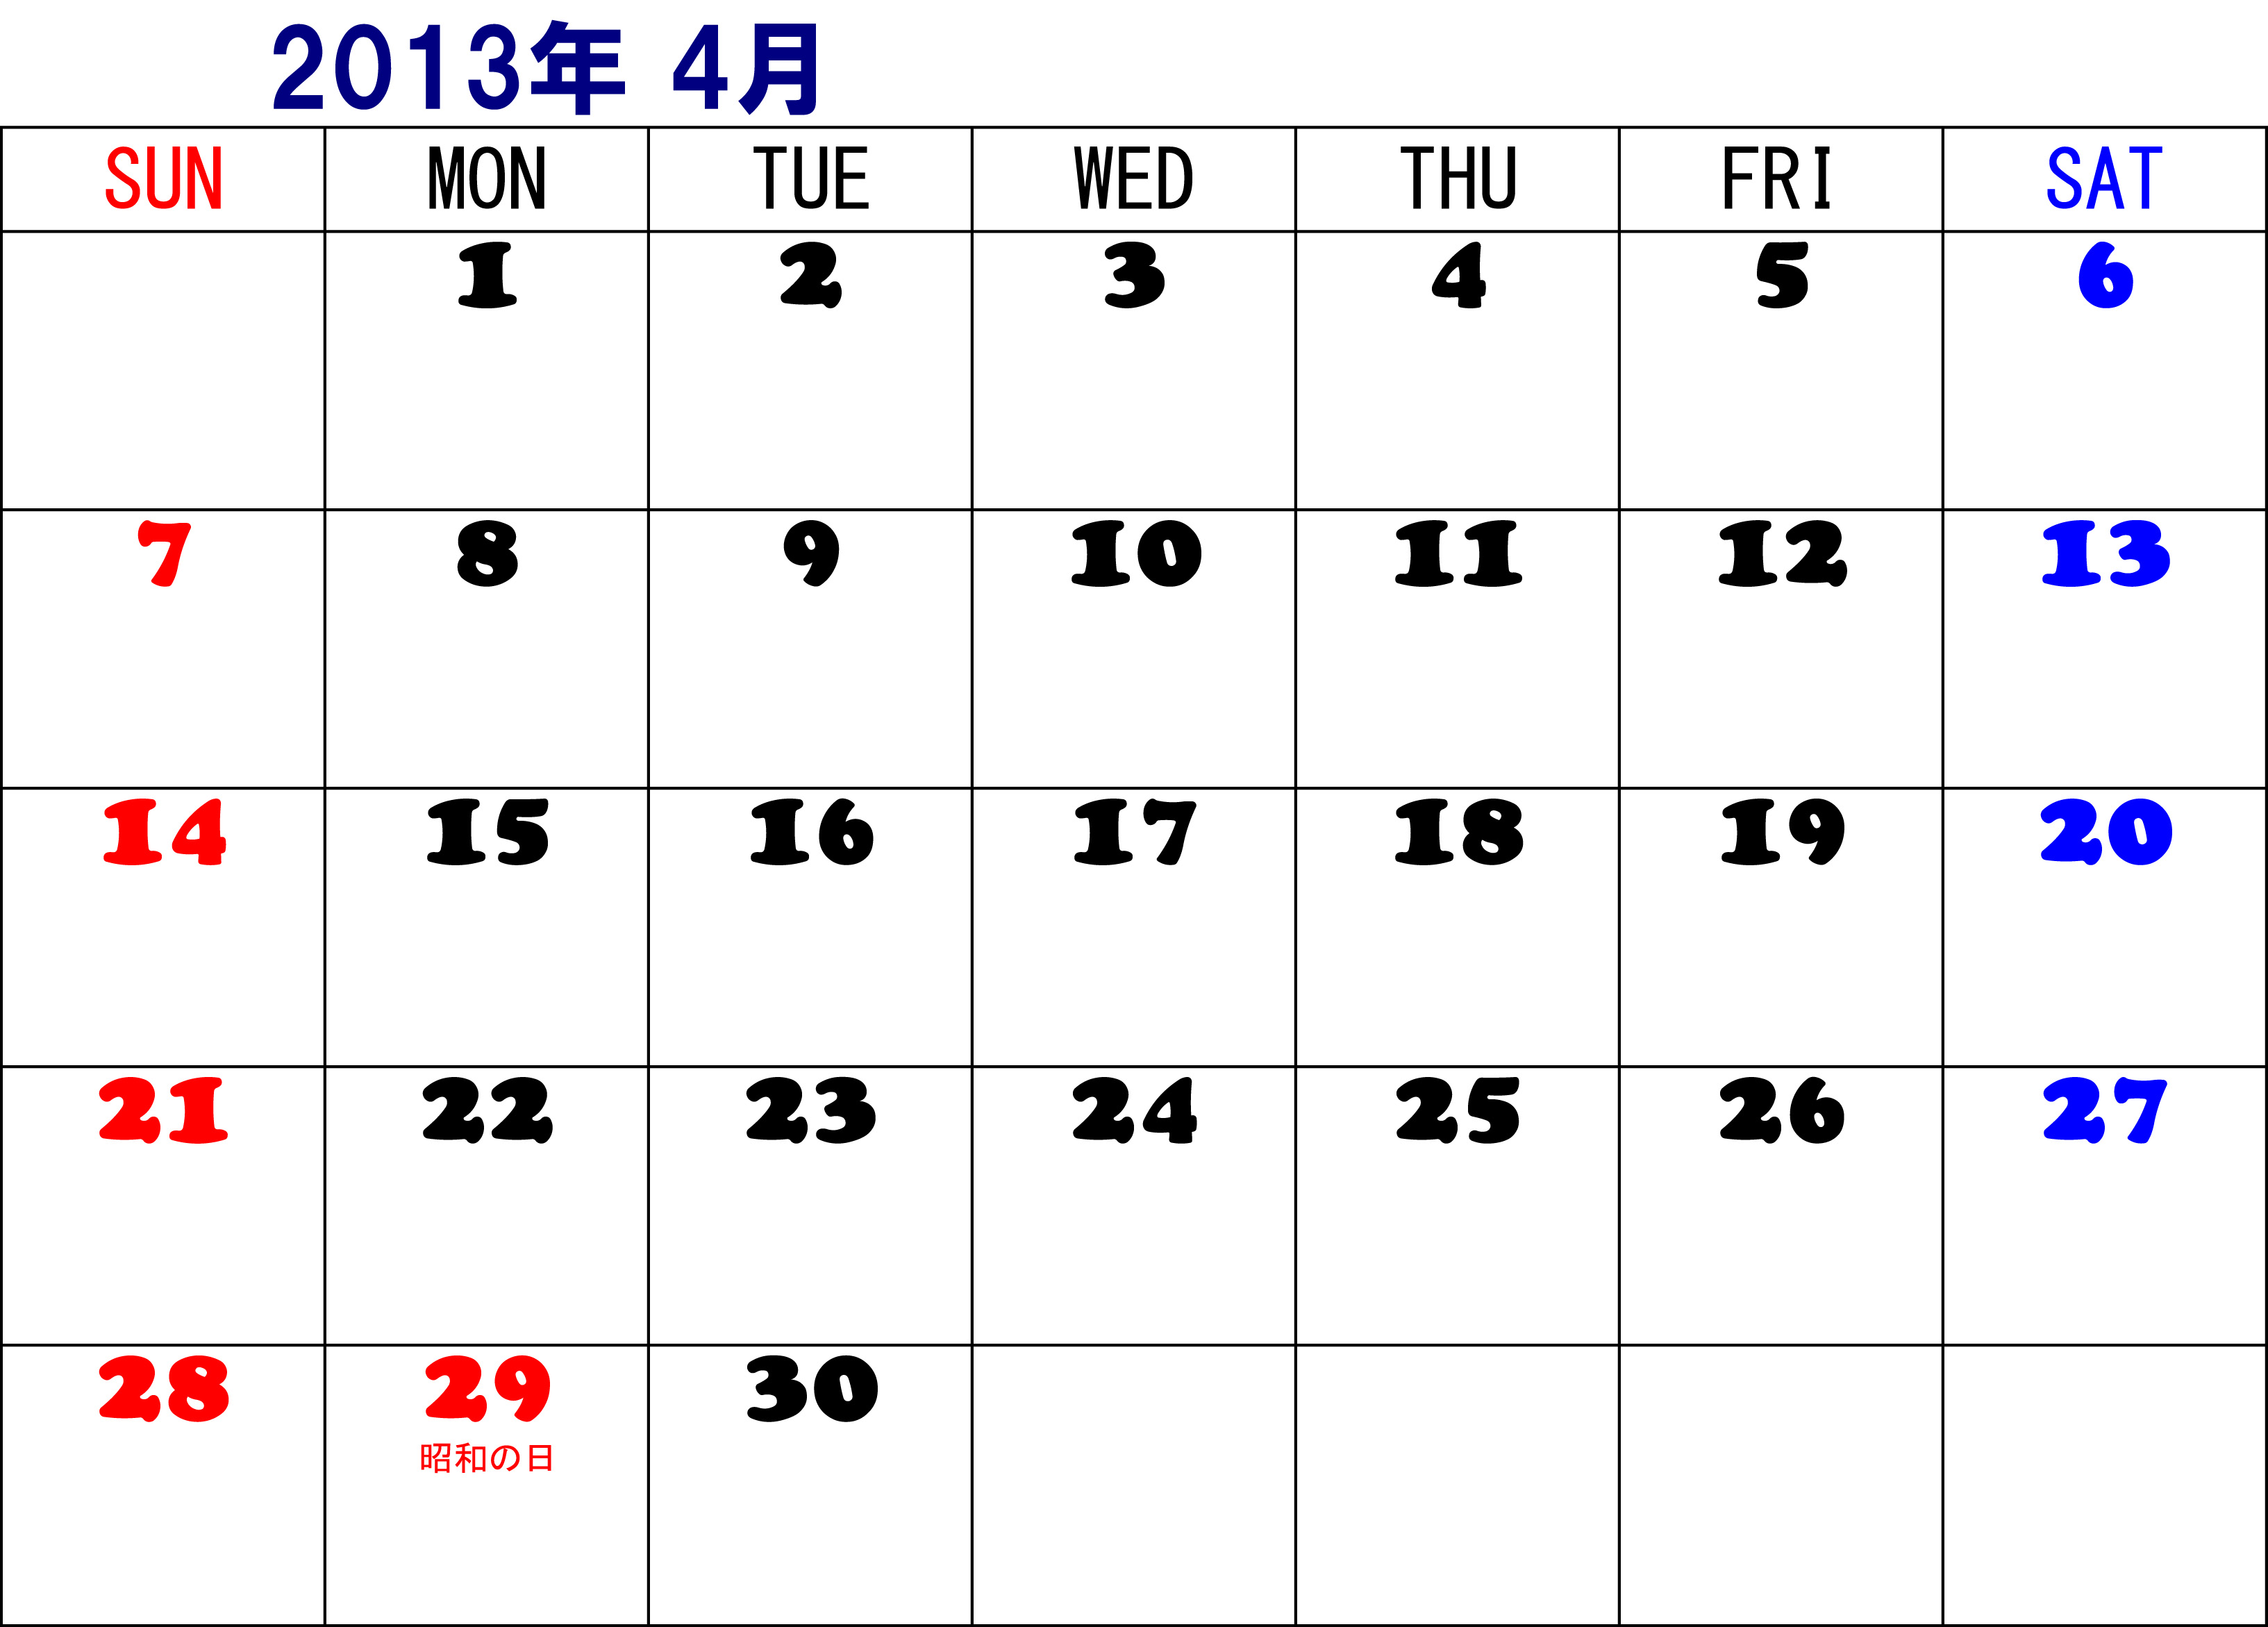 http://aaa.news.coocan.jp/link/2013_04.jpg : 2015年カレンダー 月曜始まり : カレンダー